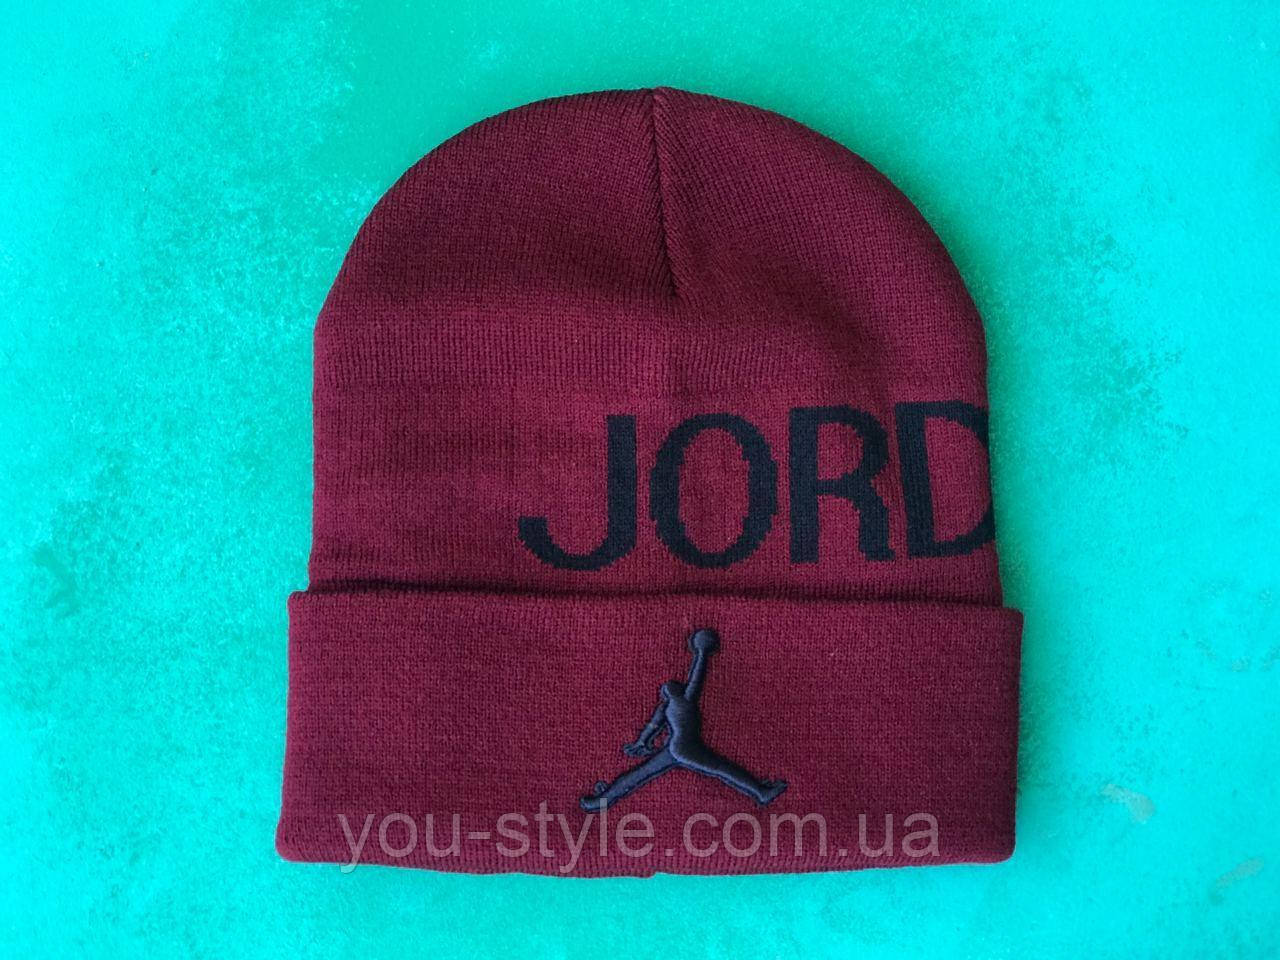 Шапка JORDAN  / шапка джордан / шапка женская/шапка мужская/бордовый